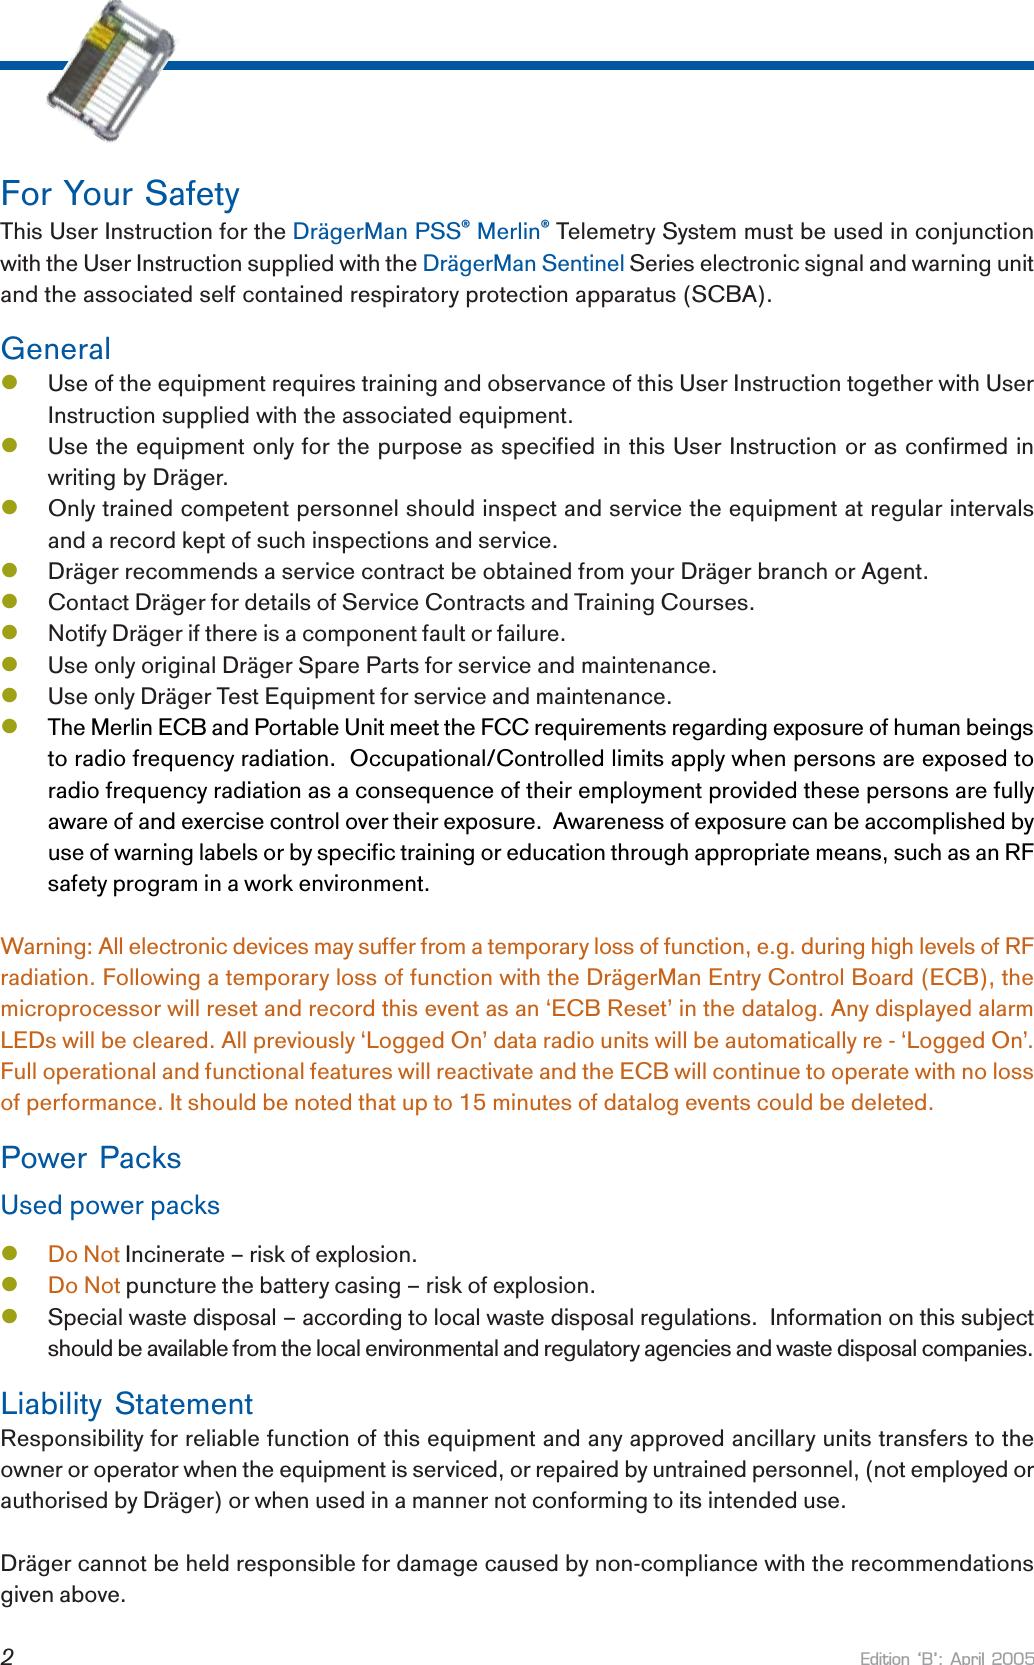 Britishv8 Forum Re Vg30 Info Manual Guide